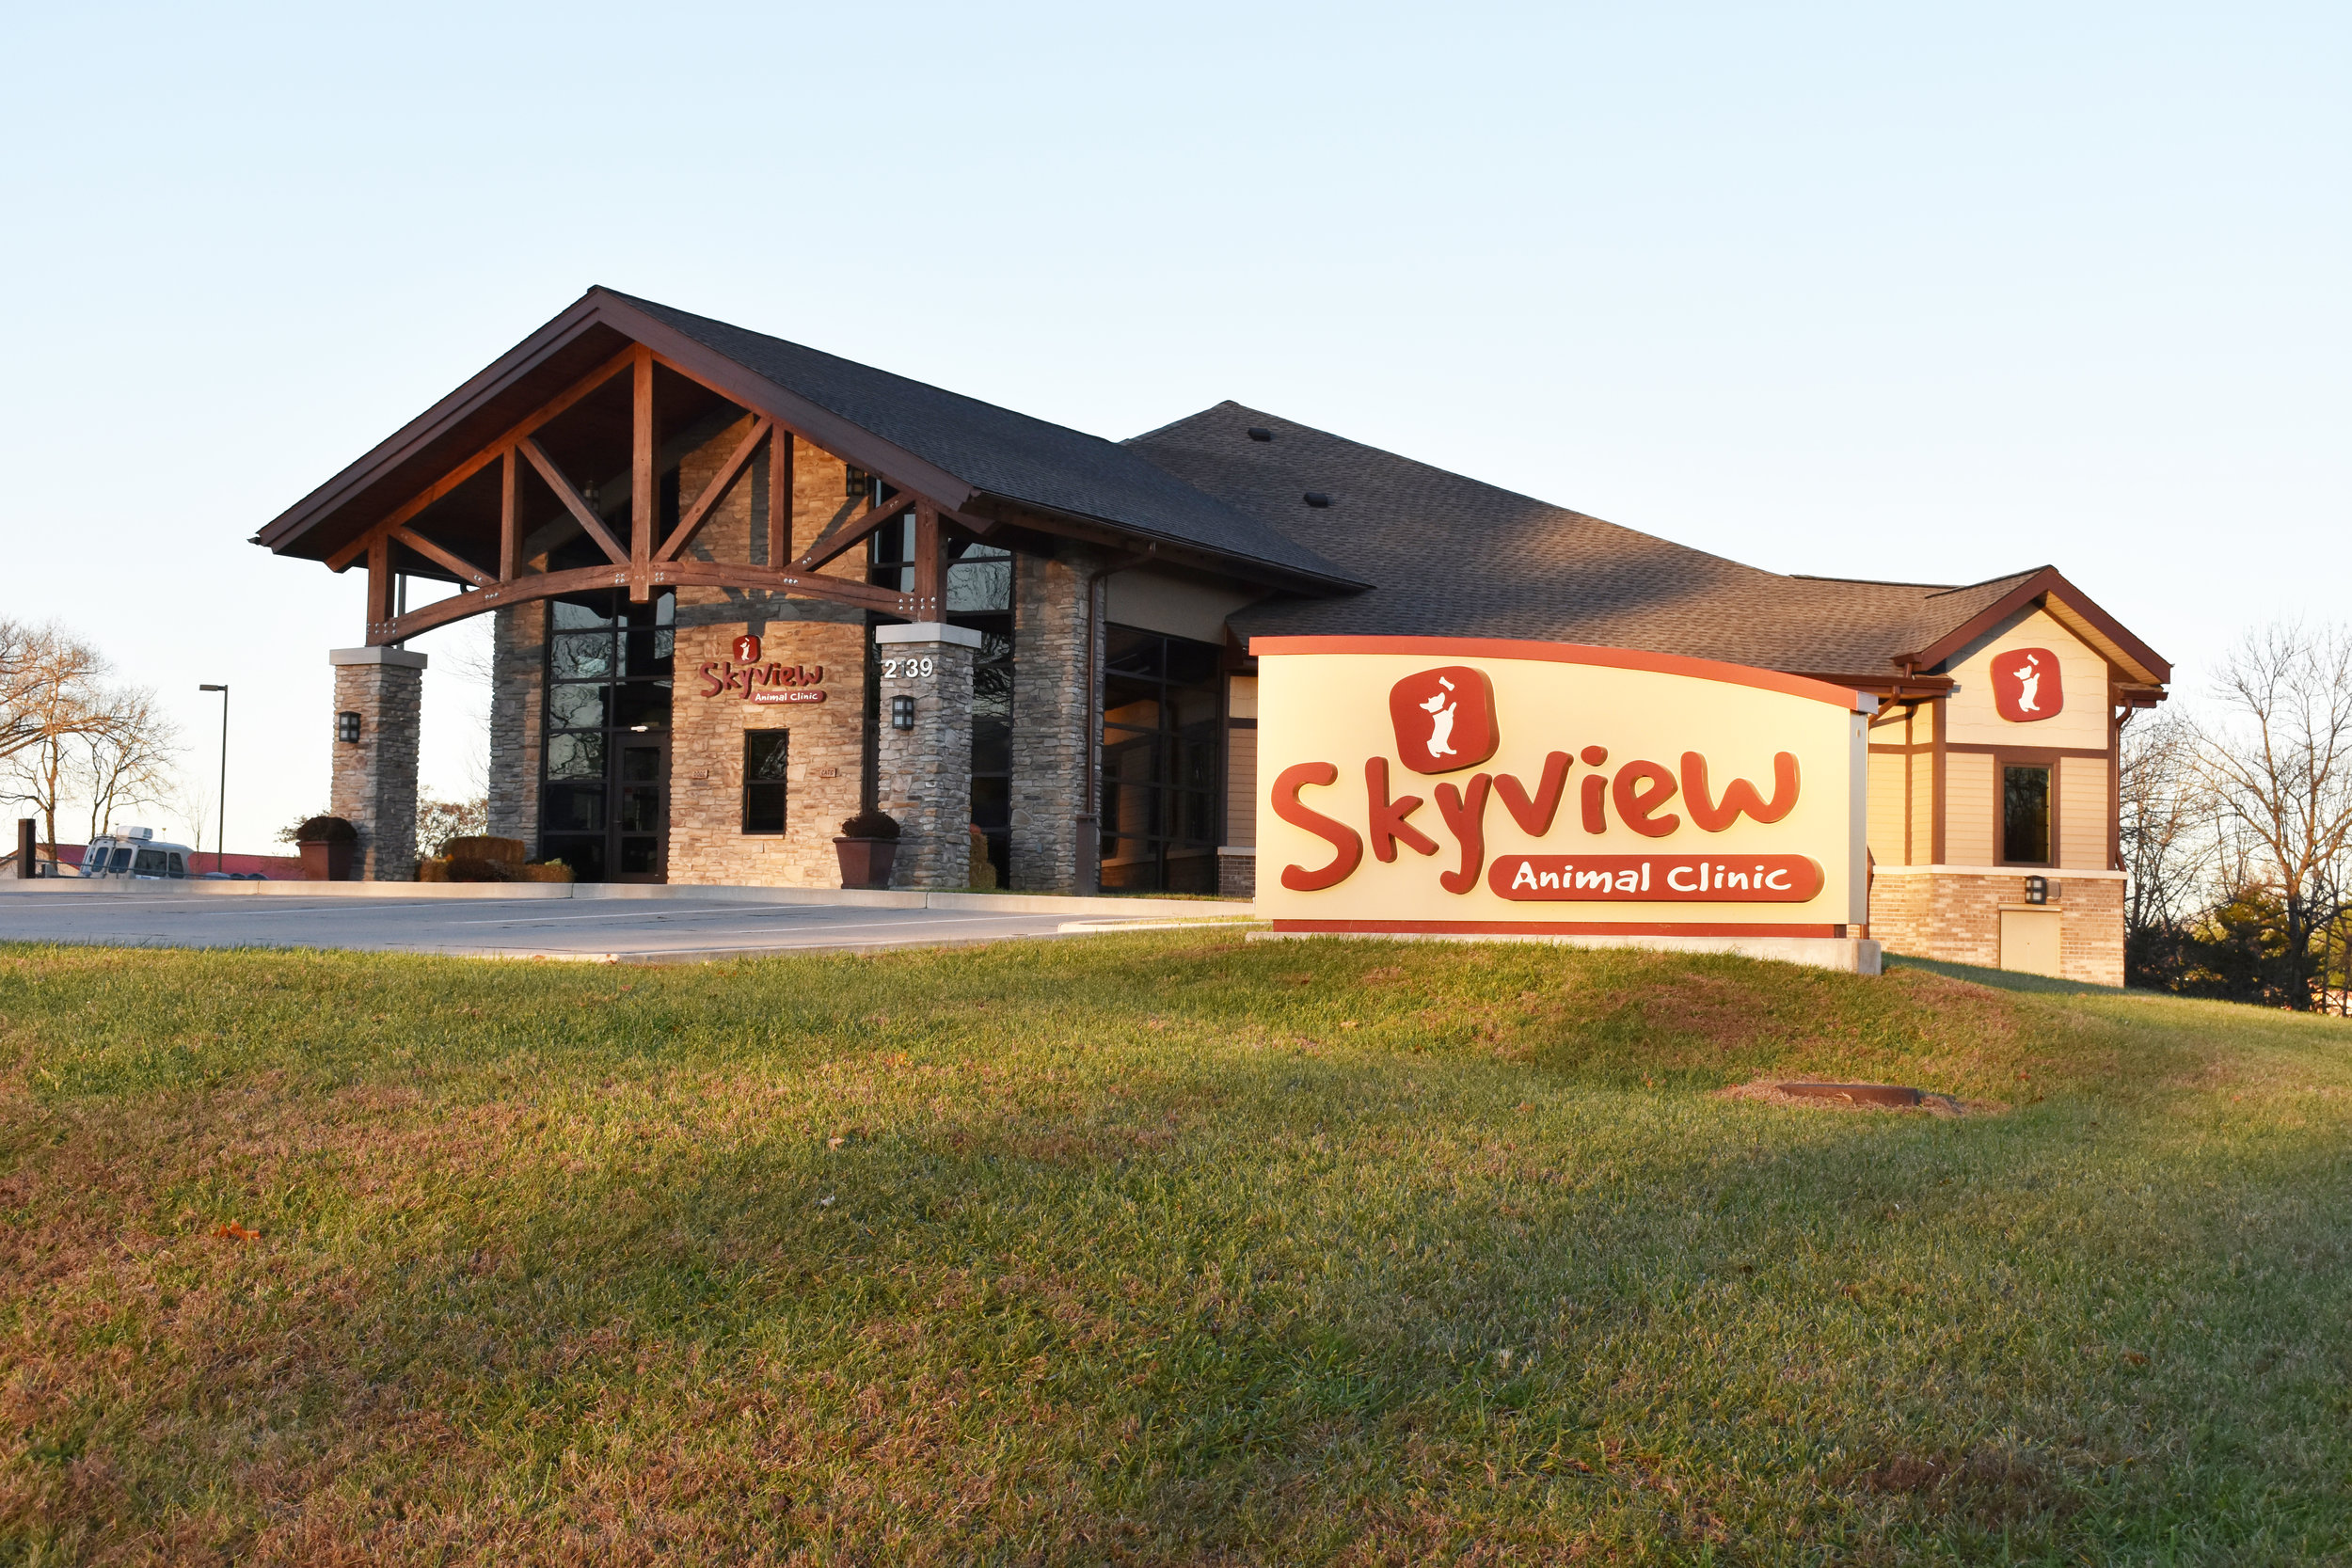 Skyview Animal Clinic - Cape Girardeau, Missouri